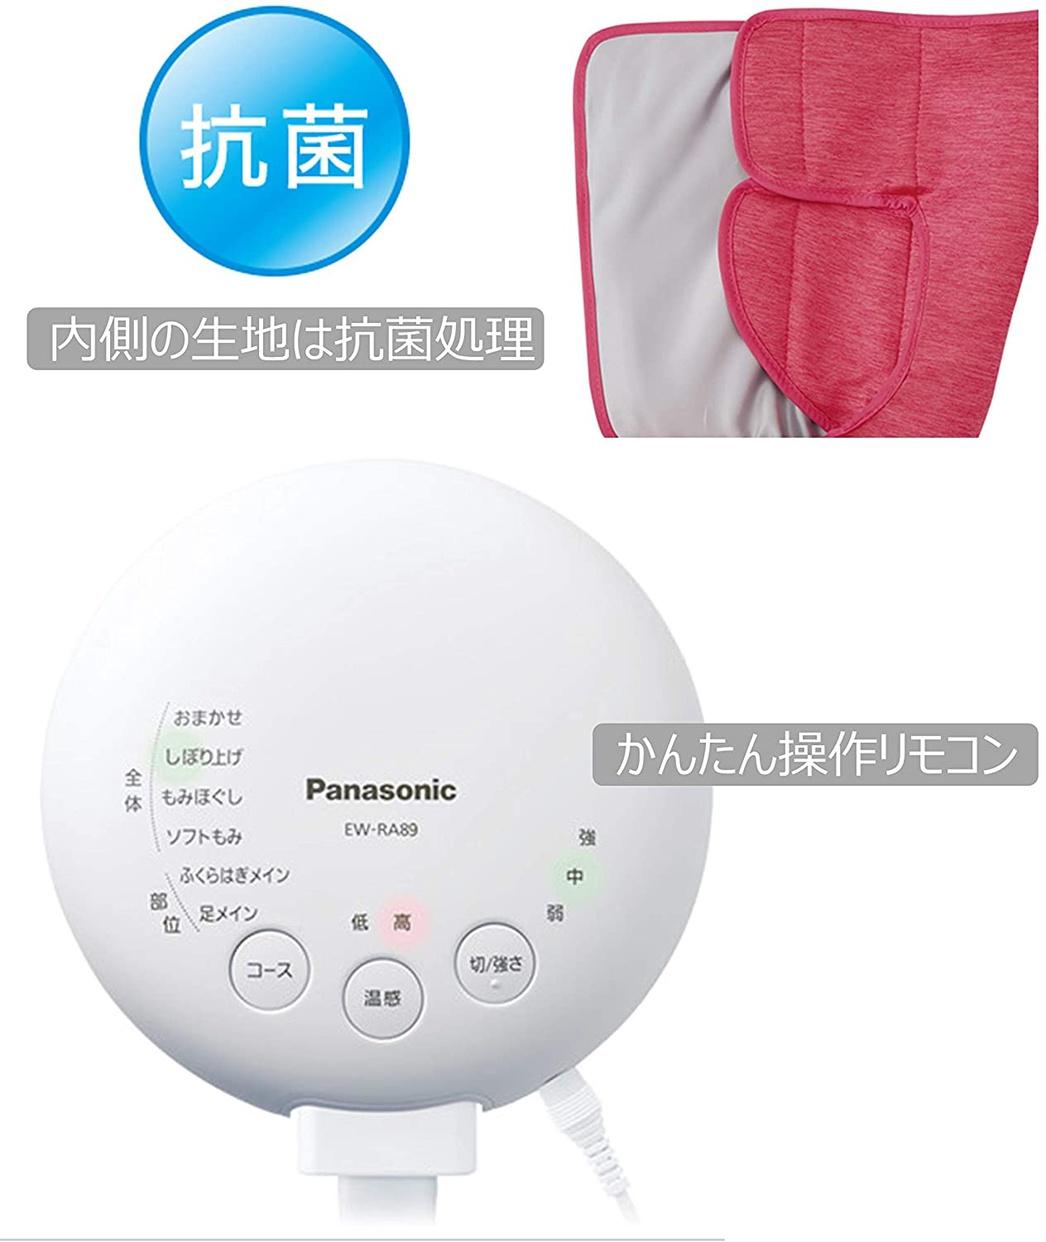 Panasonic(パナソニック) エアーマッサージャー レッグリフレ EW-RA89の商品画像6